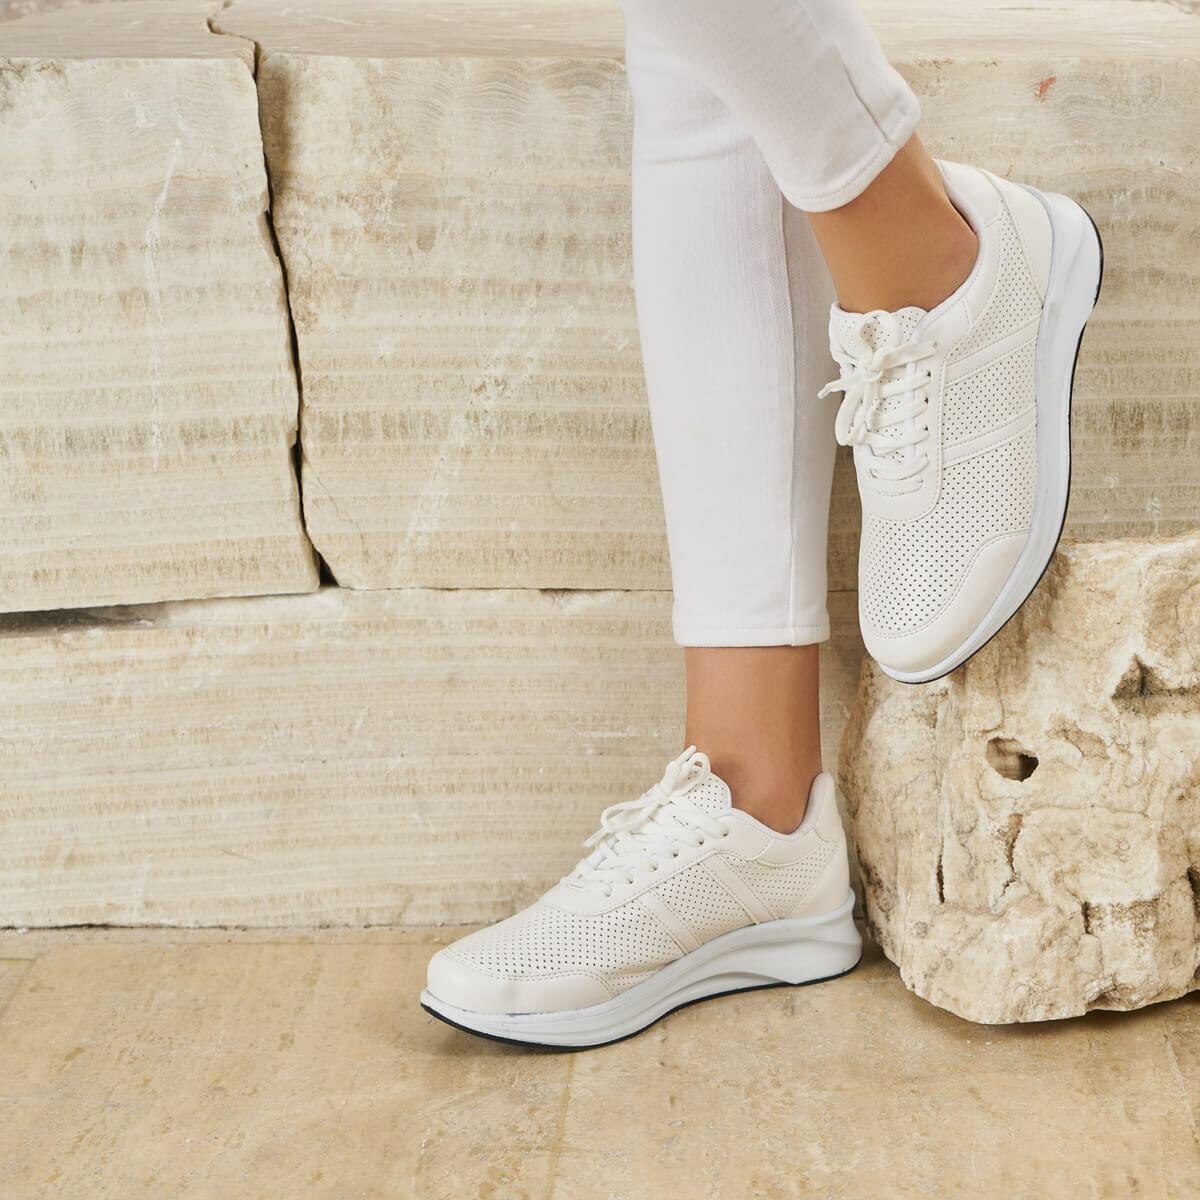 FLO PADELLİ01Z White Women 'S Sneaker Shoes BUTIGO